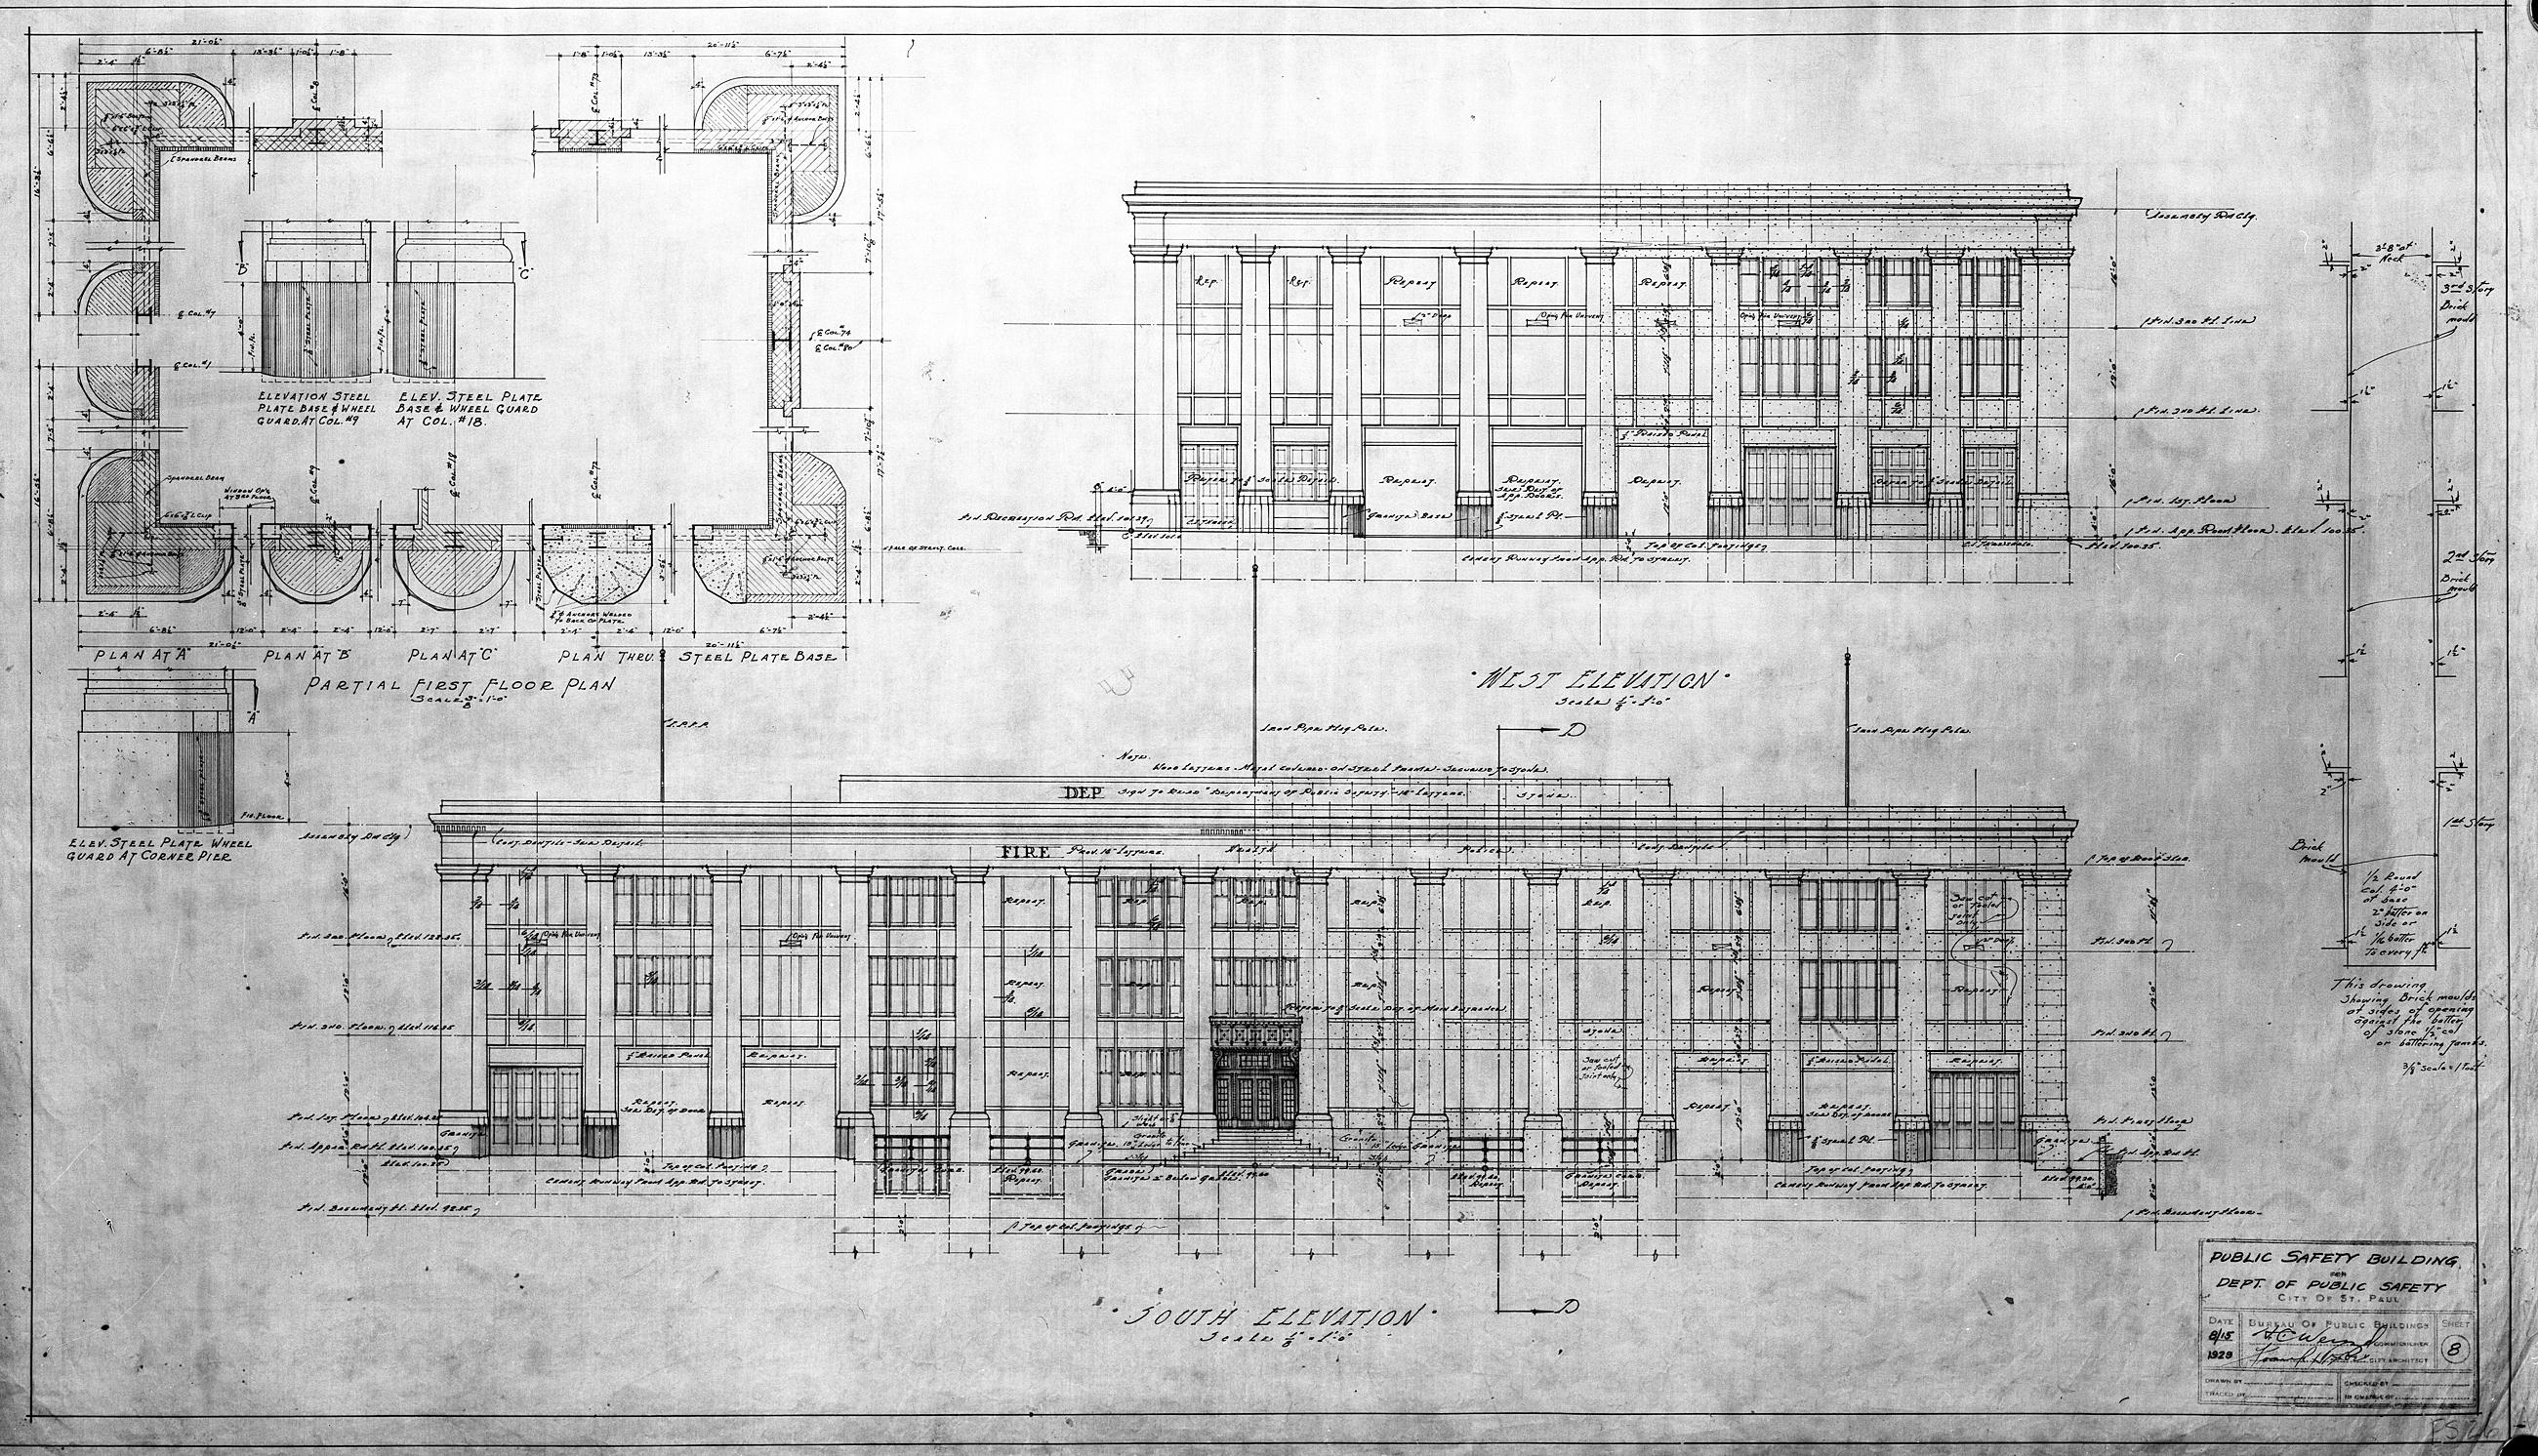 Main Elevation Plan - MHPR RA-SPC-5426-43 (Please credit Daniel R. Pratt and the Minnesota Historic Property Record)